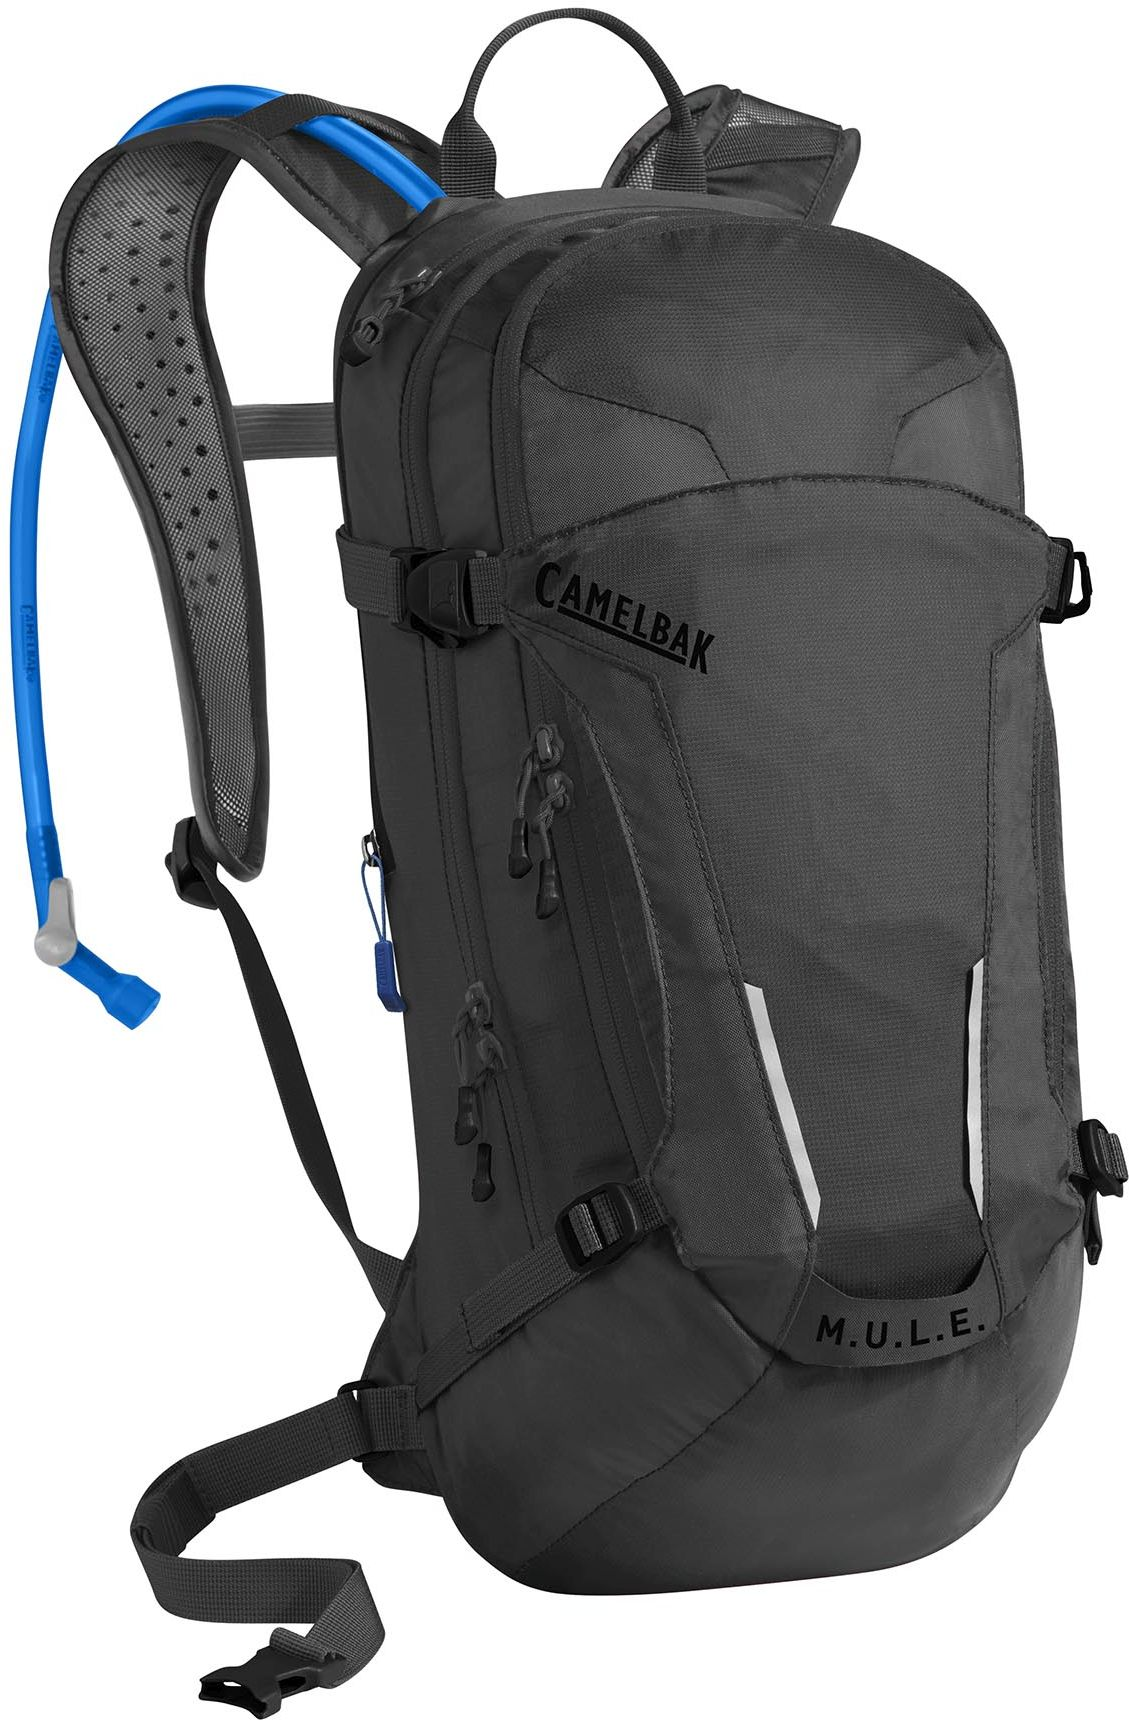 Camelbak Mule - Black uni